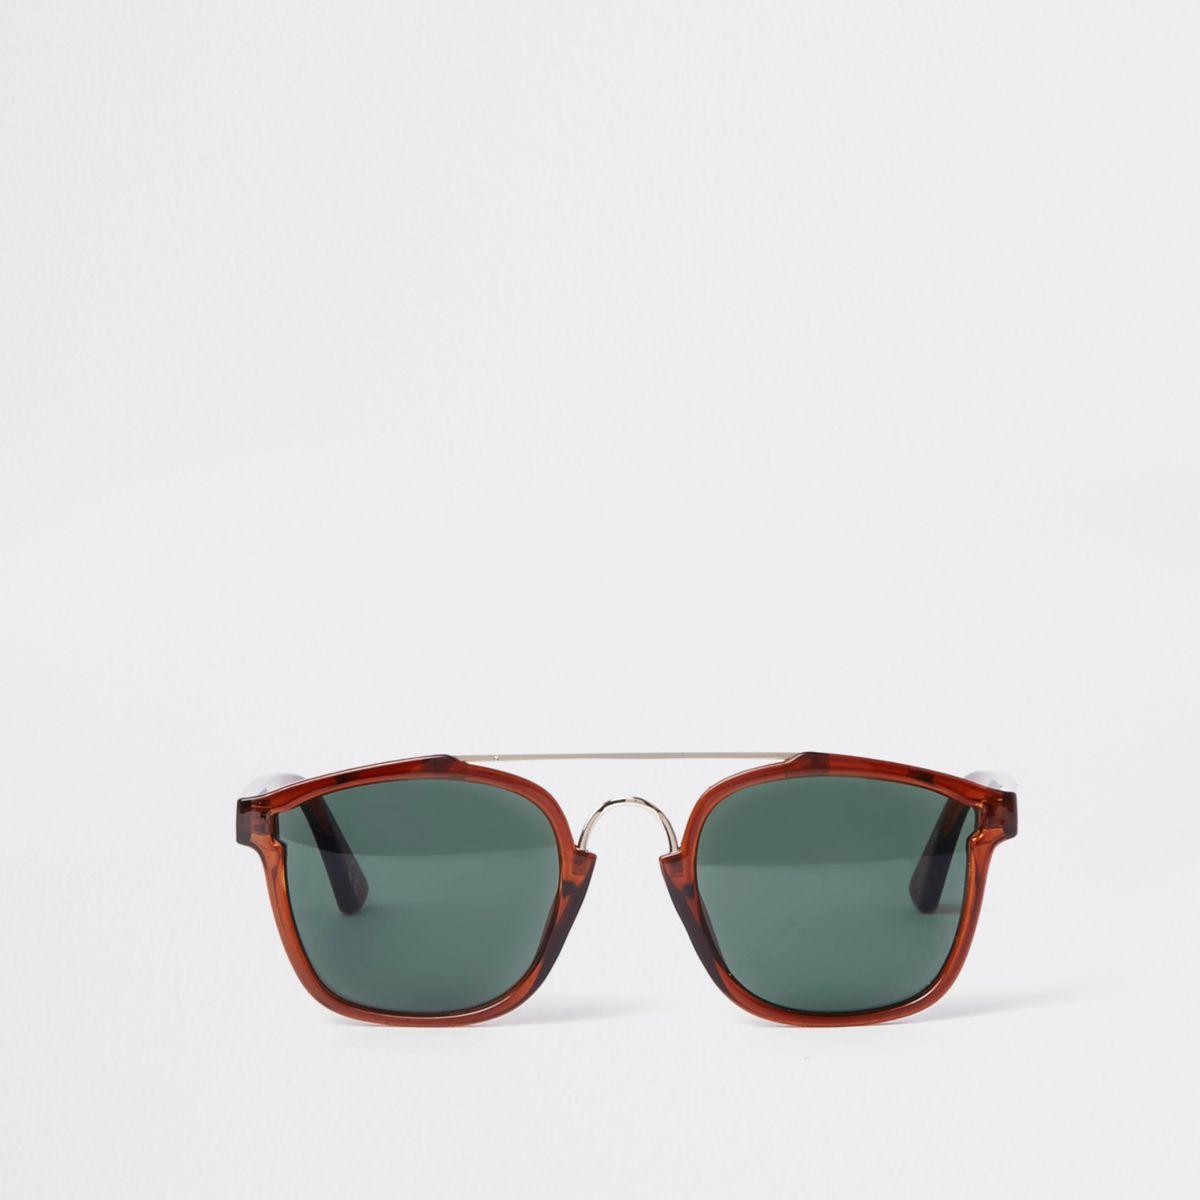 Dark brown brow bar aviator sunglasses